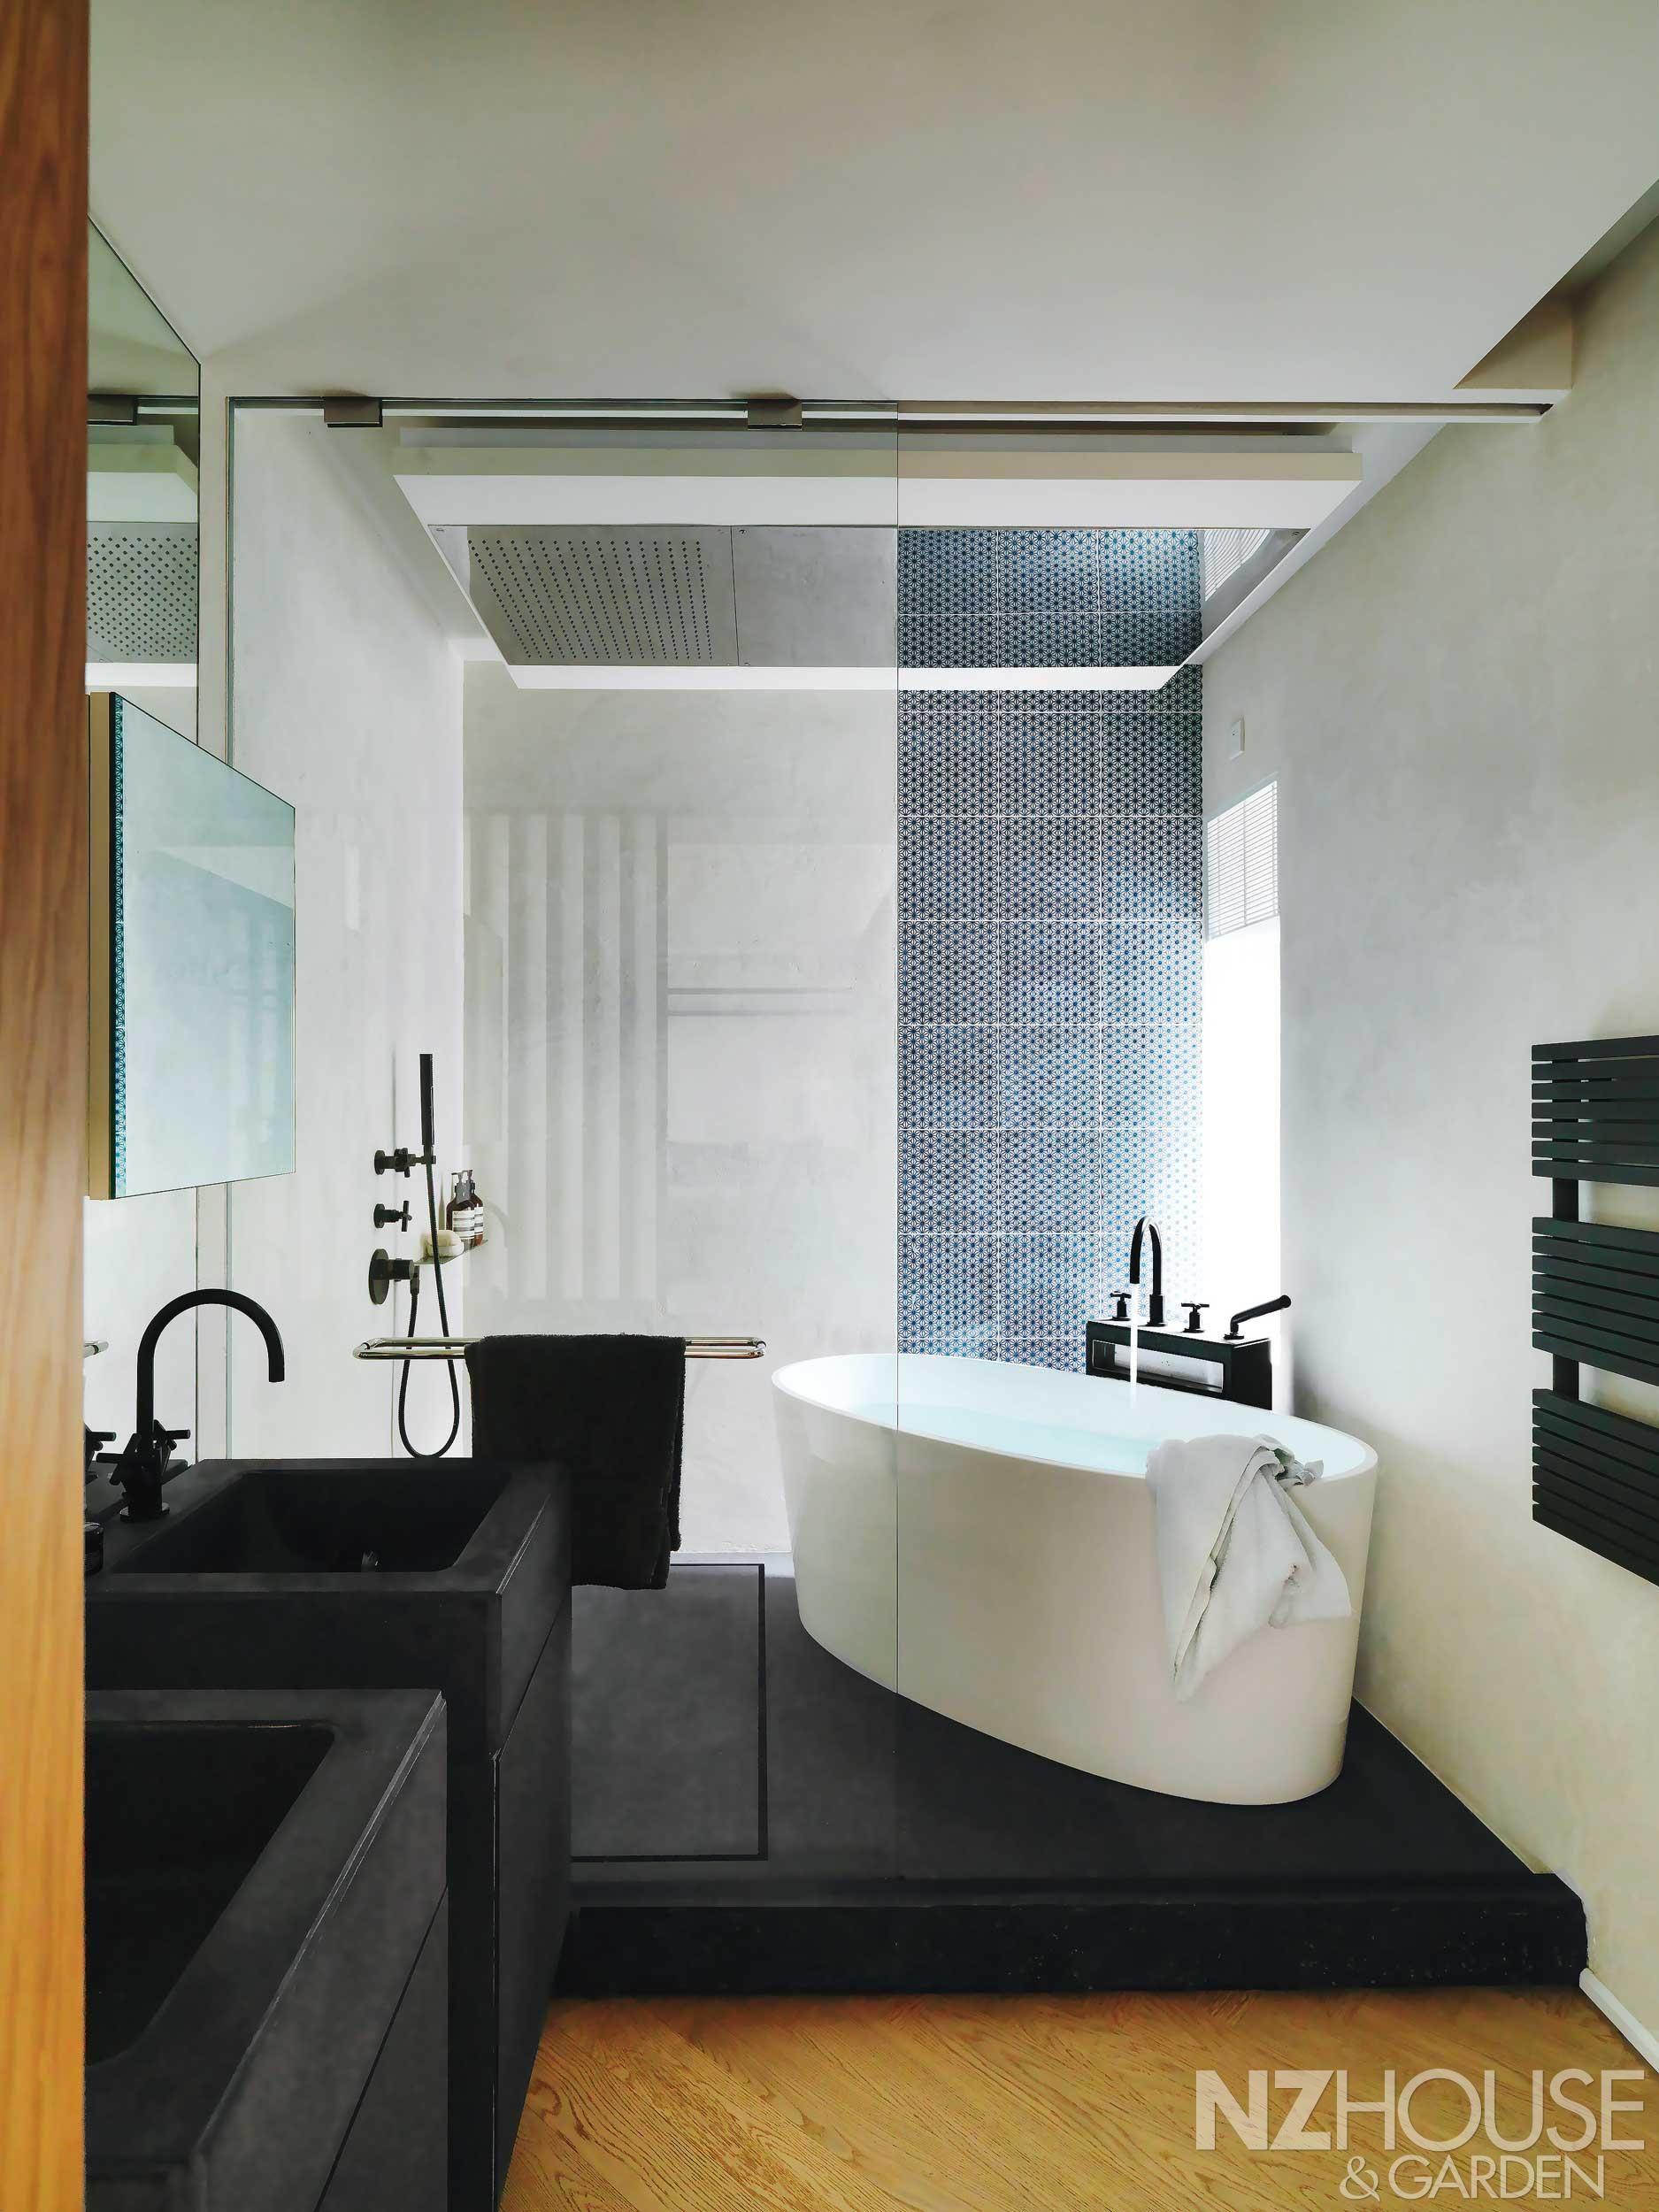 new bathroom images%0A A glamorous bathroom in Hong Kong